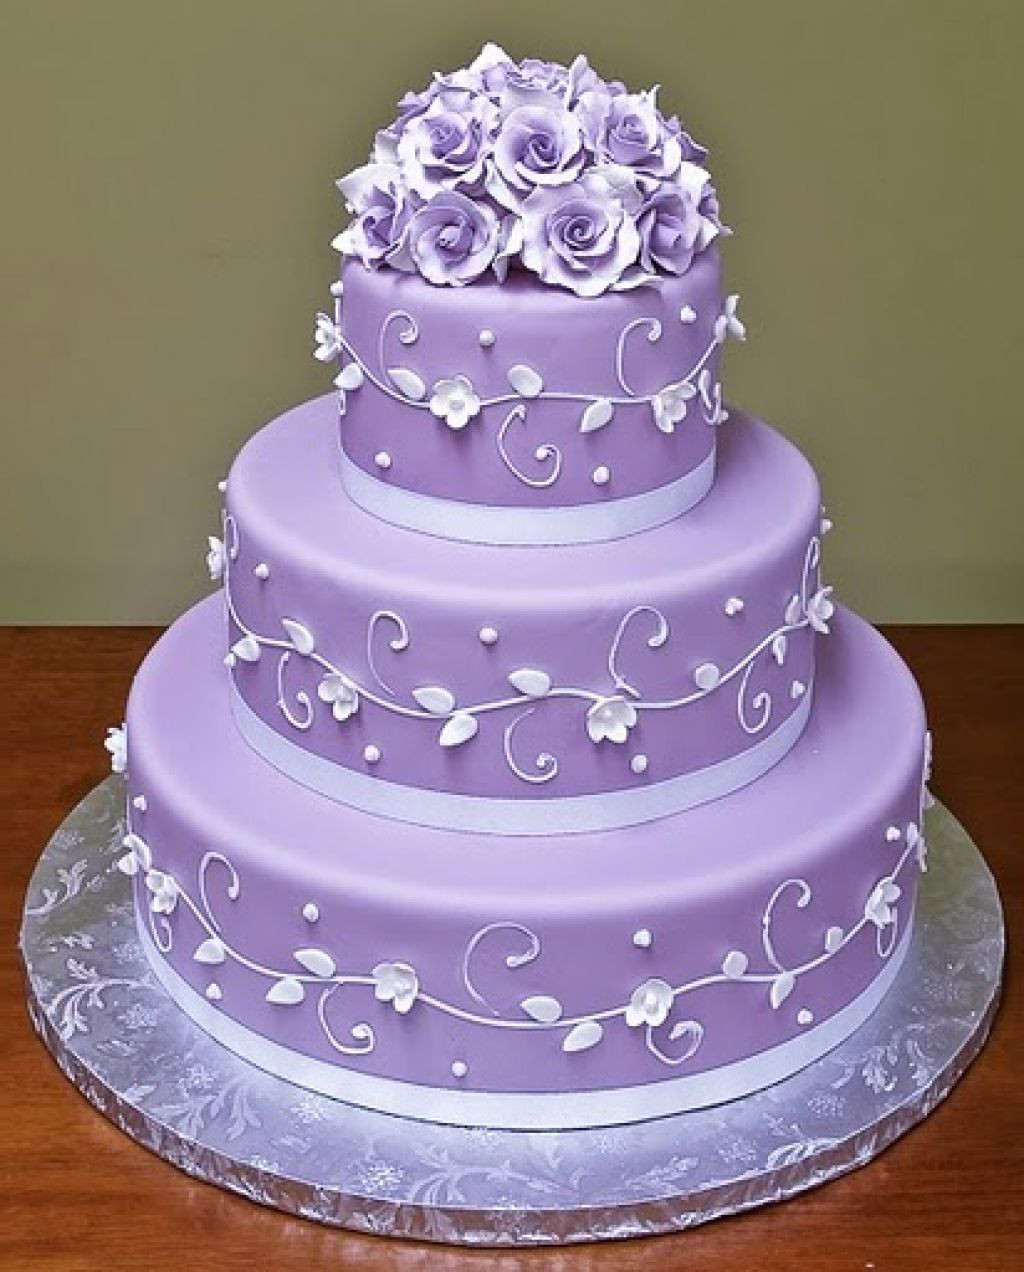 Lavender Wedding Cakes Pictures  Purple Wedding Cakes baking Pinterest